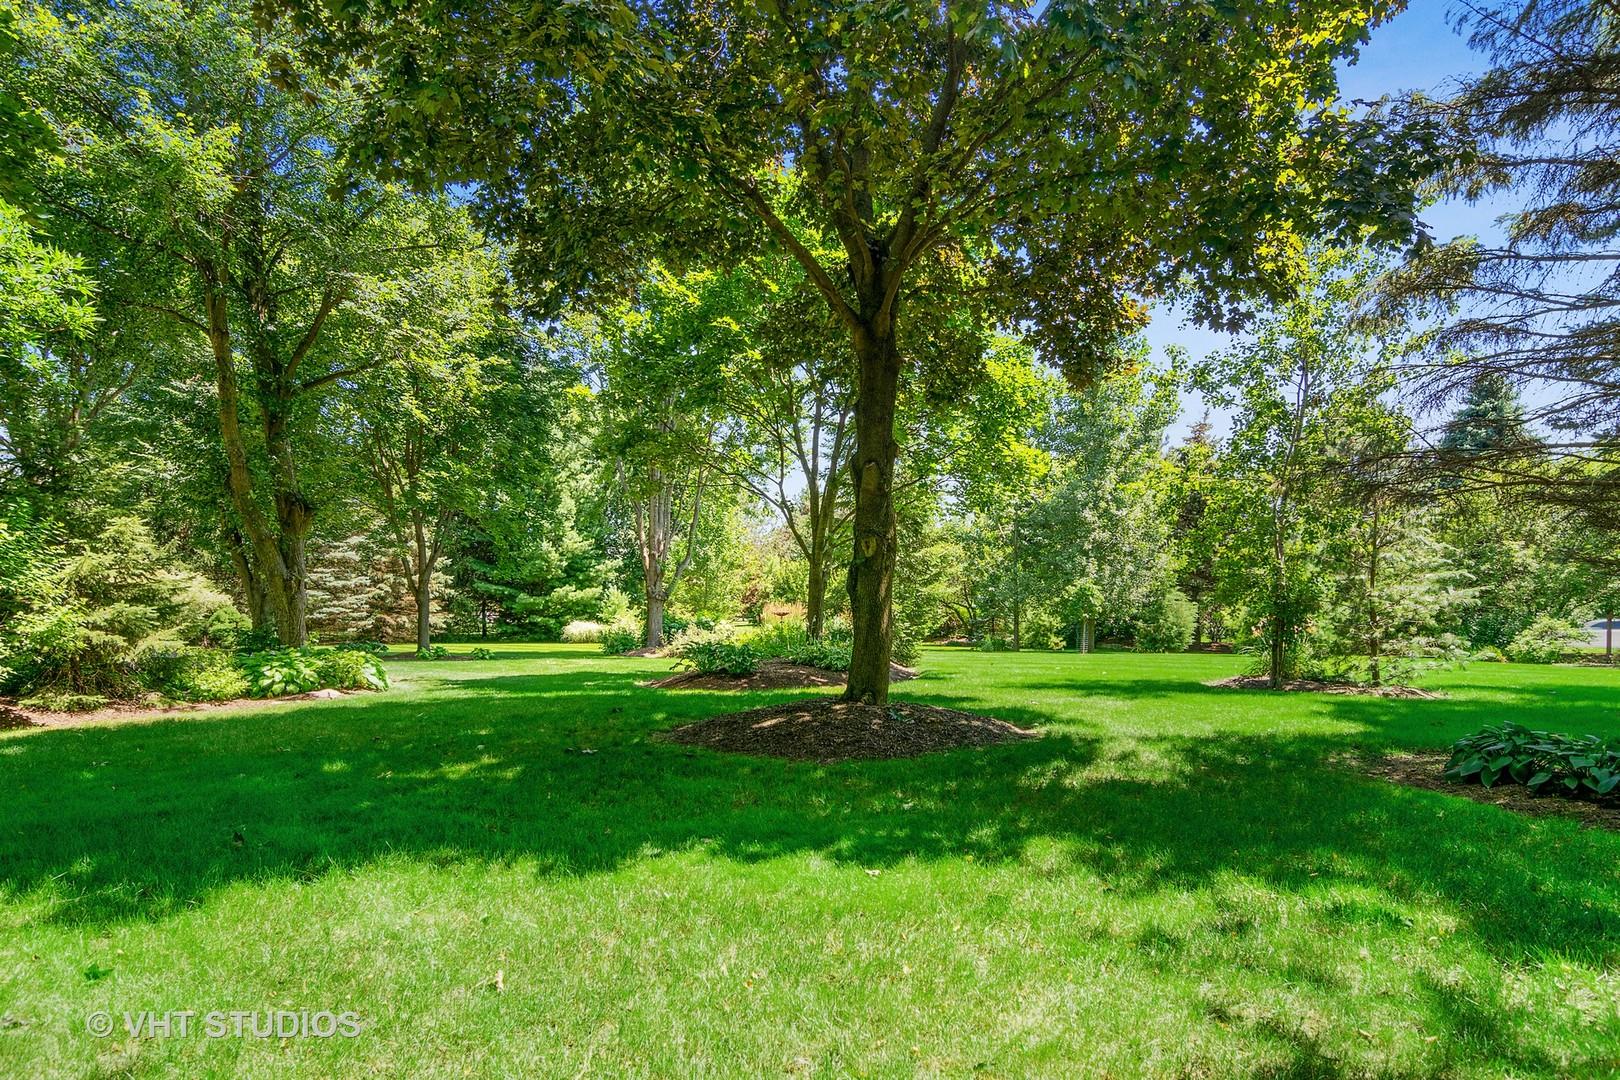 1055 Crabapple, St. Charles, Illinois, 60174